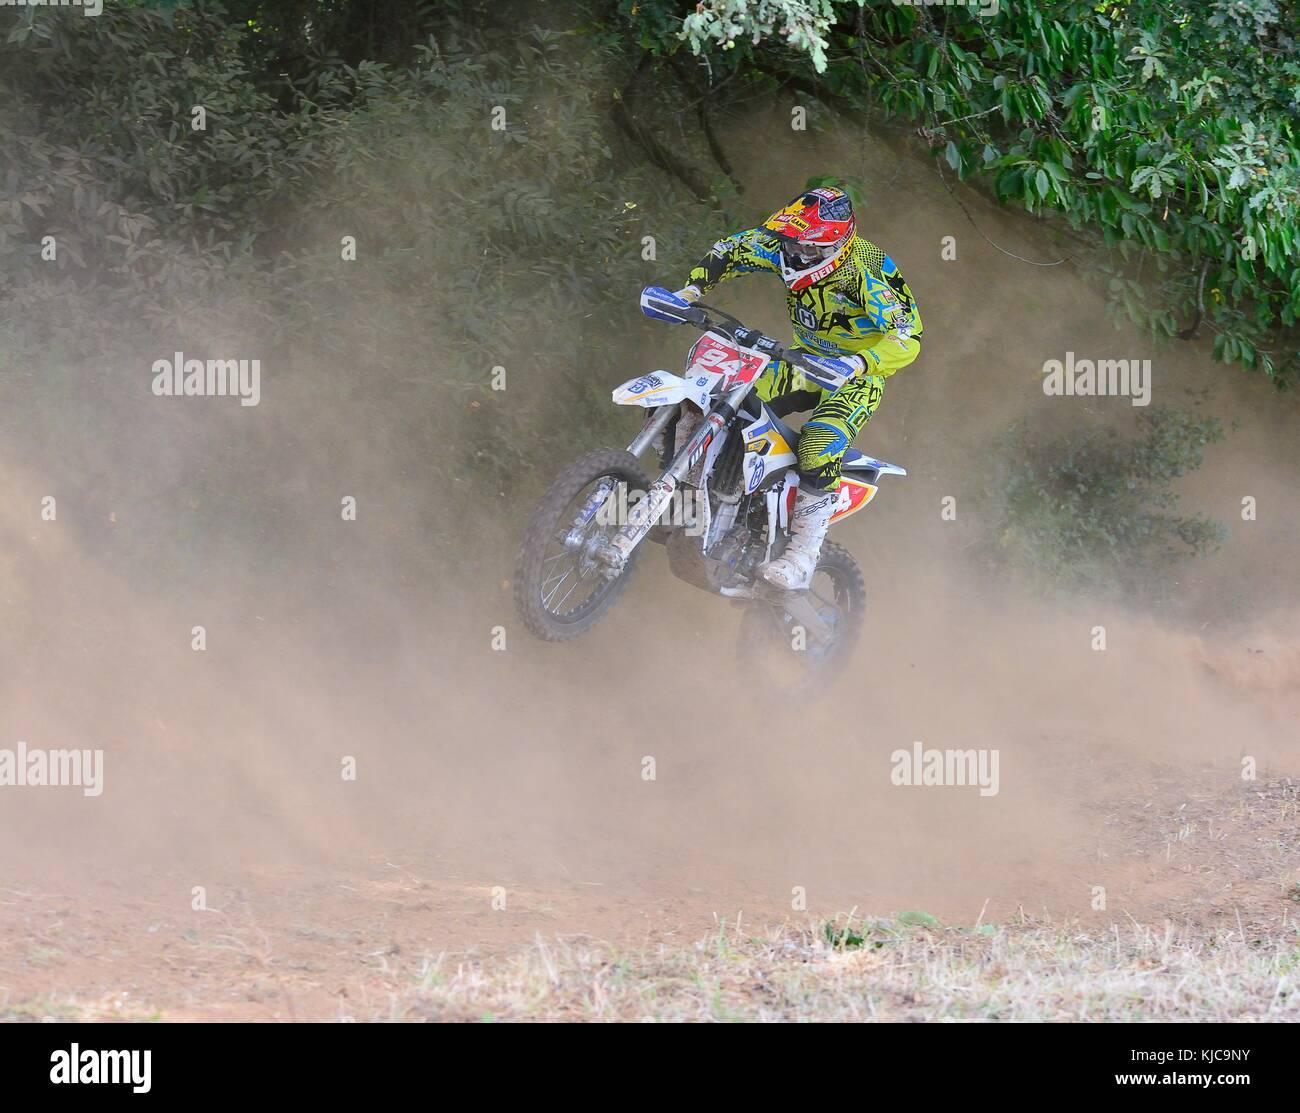 SARIEGO, SPAIN - AUGUST 17: Legendary Sariego motocross test in August 17, 2015 in Sariego, Spain. Jaume Betriu - Stock Image